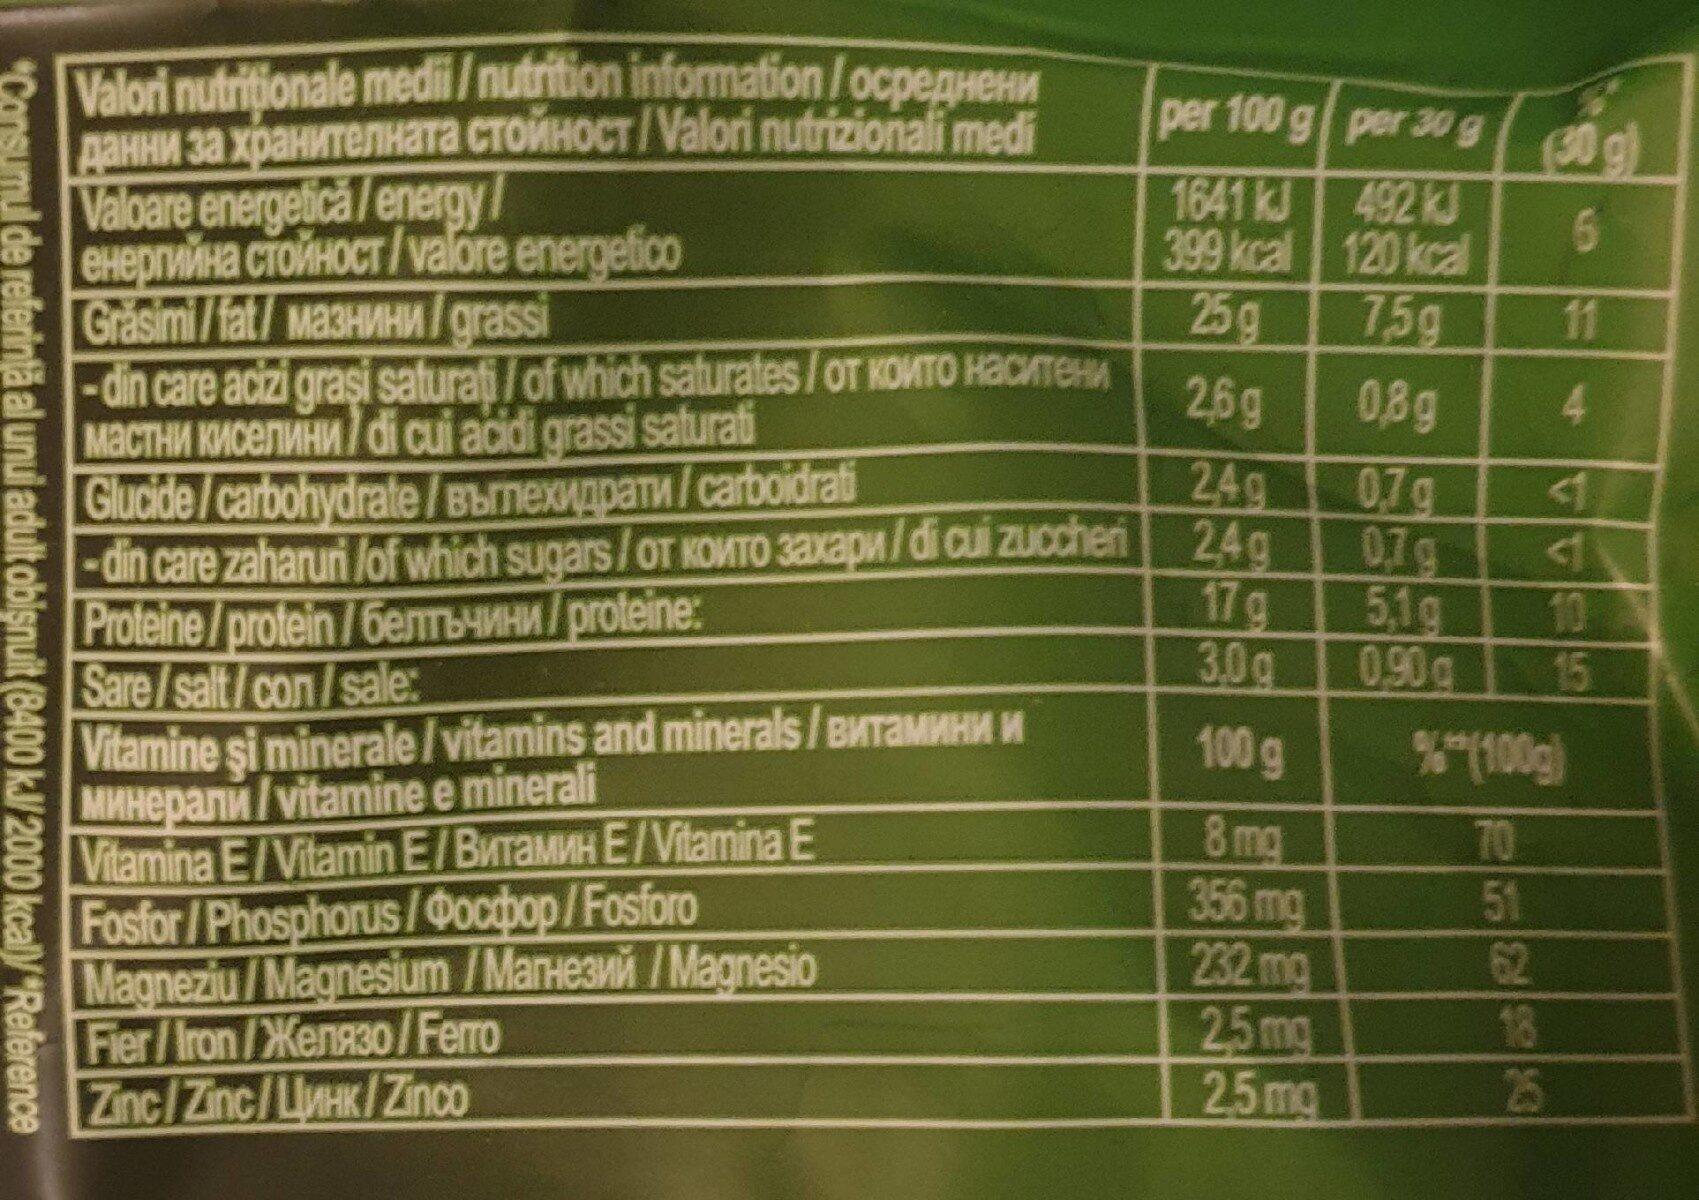 Nutline Seminte Pestrite - Informations nutritionnelles - fr